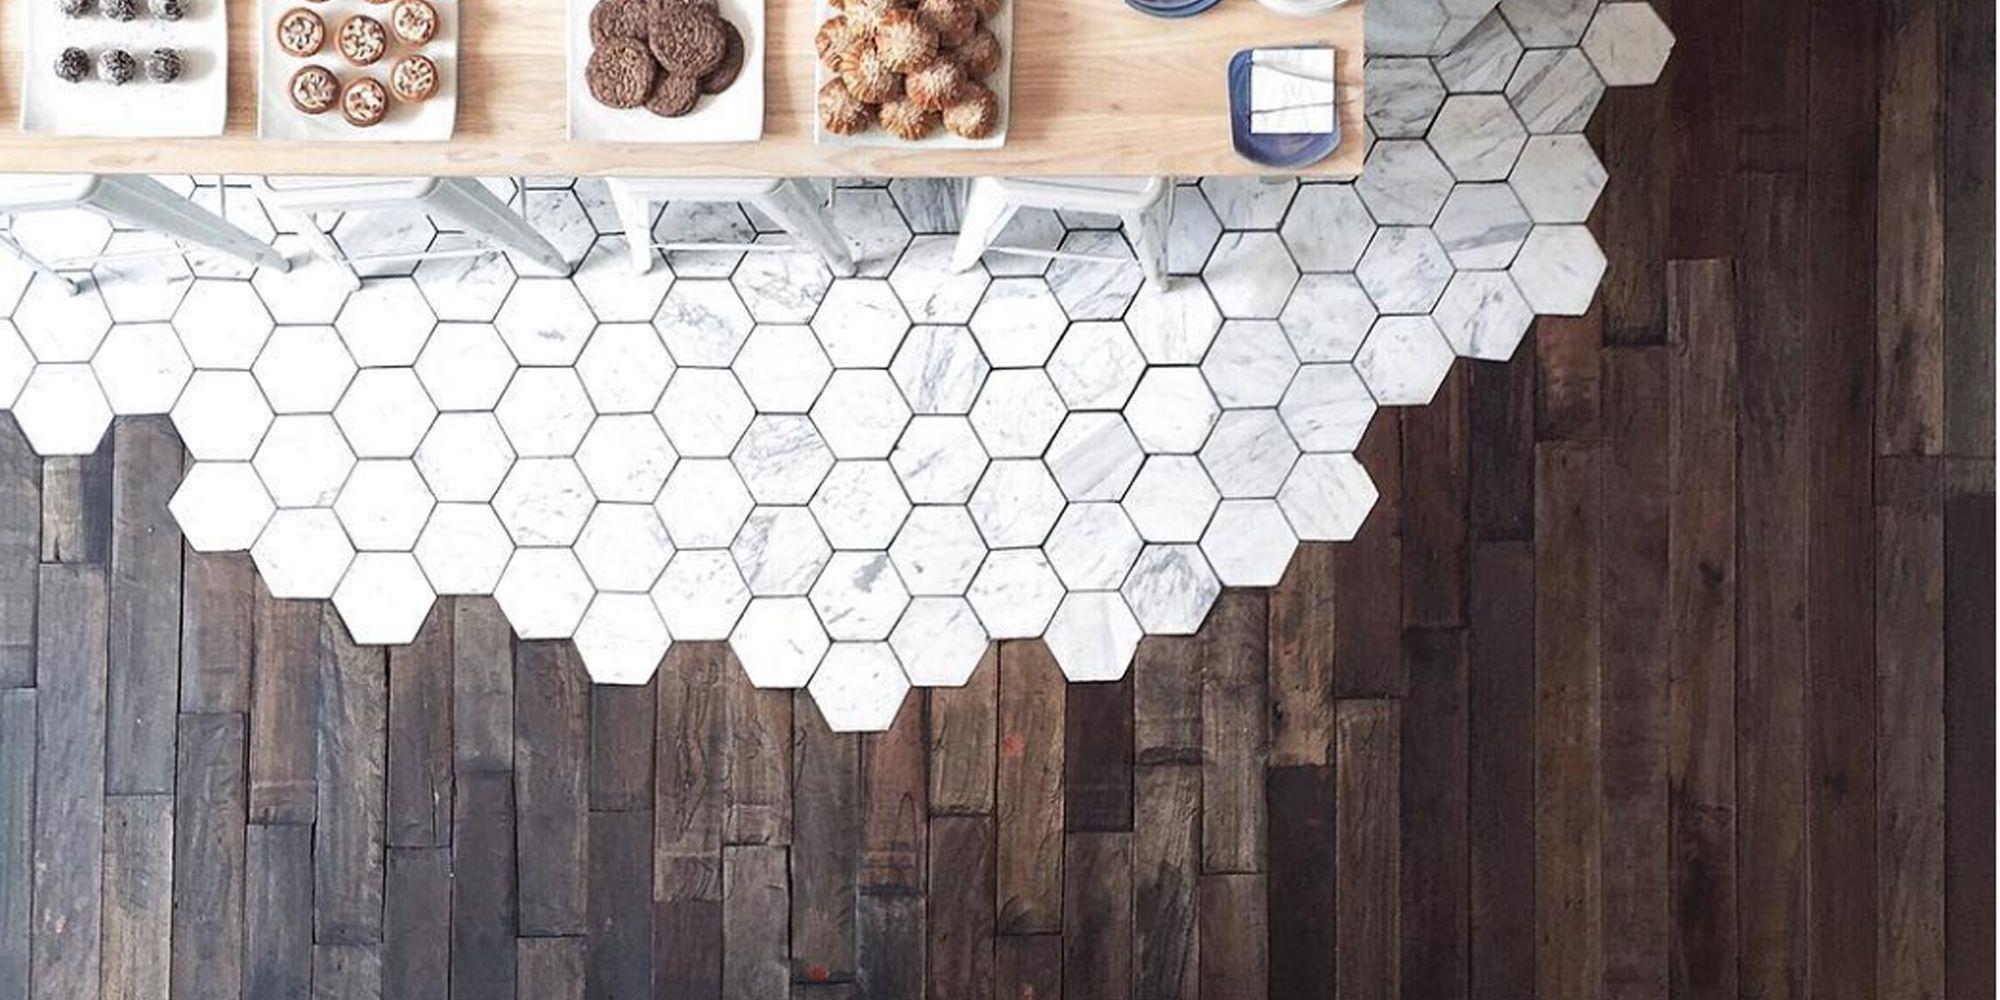 hexagonal tiles and hardwood make the